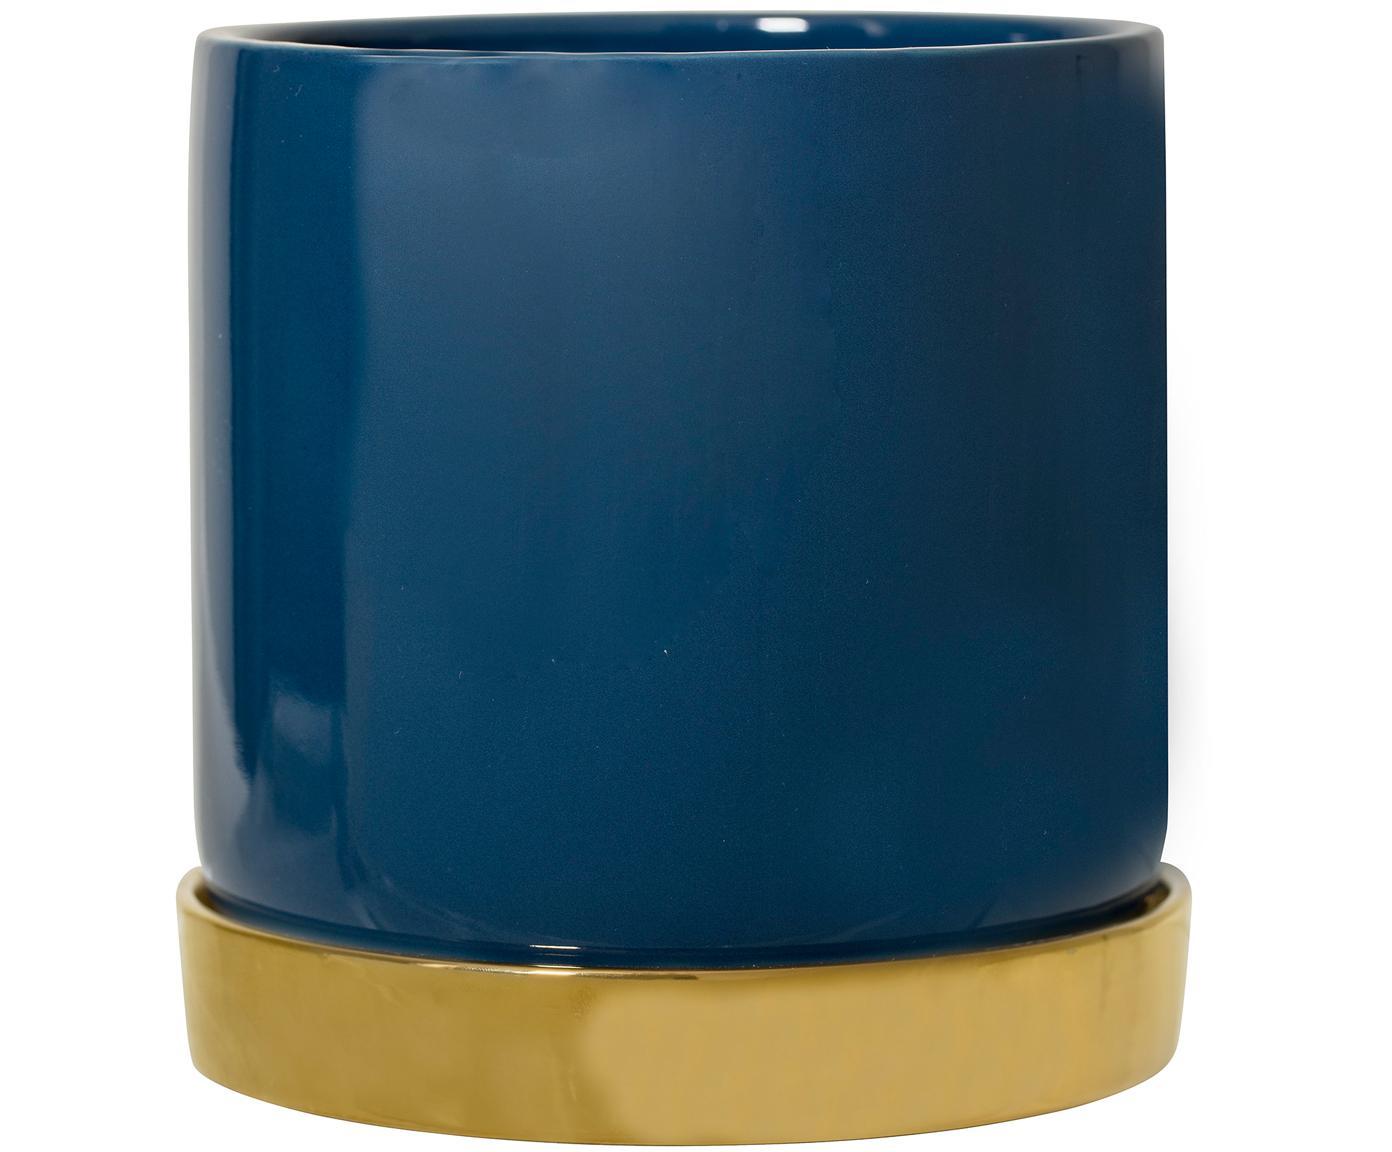 Pflanztopf Elin, Steingut, Topf: BlauUntersetzer: Gold, Ø 14 x H 14 cm